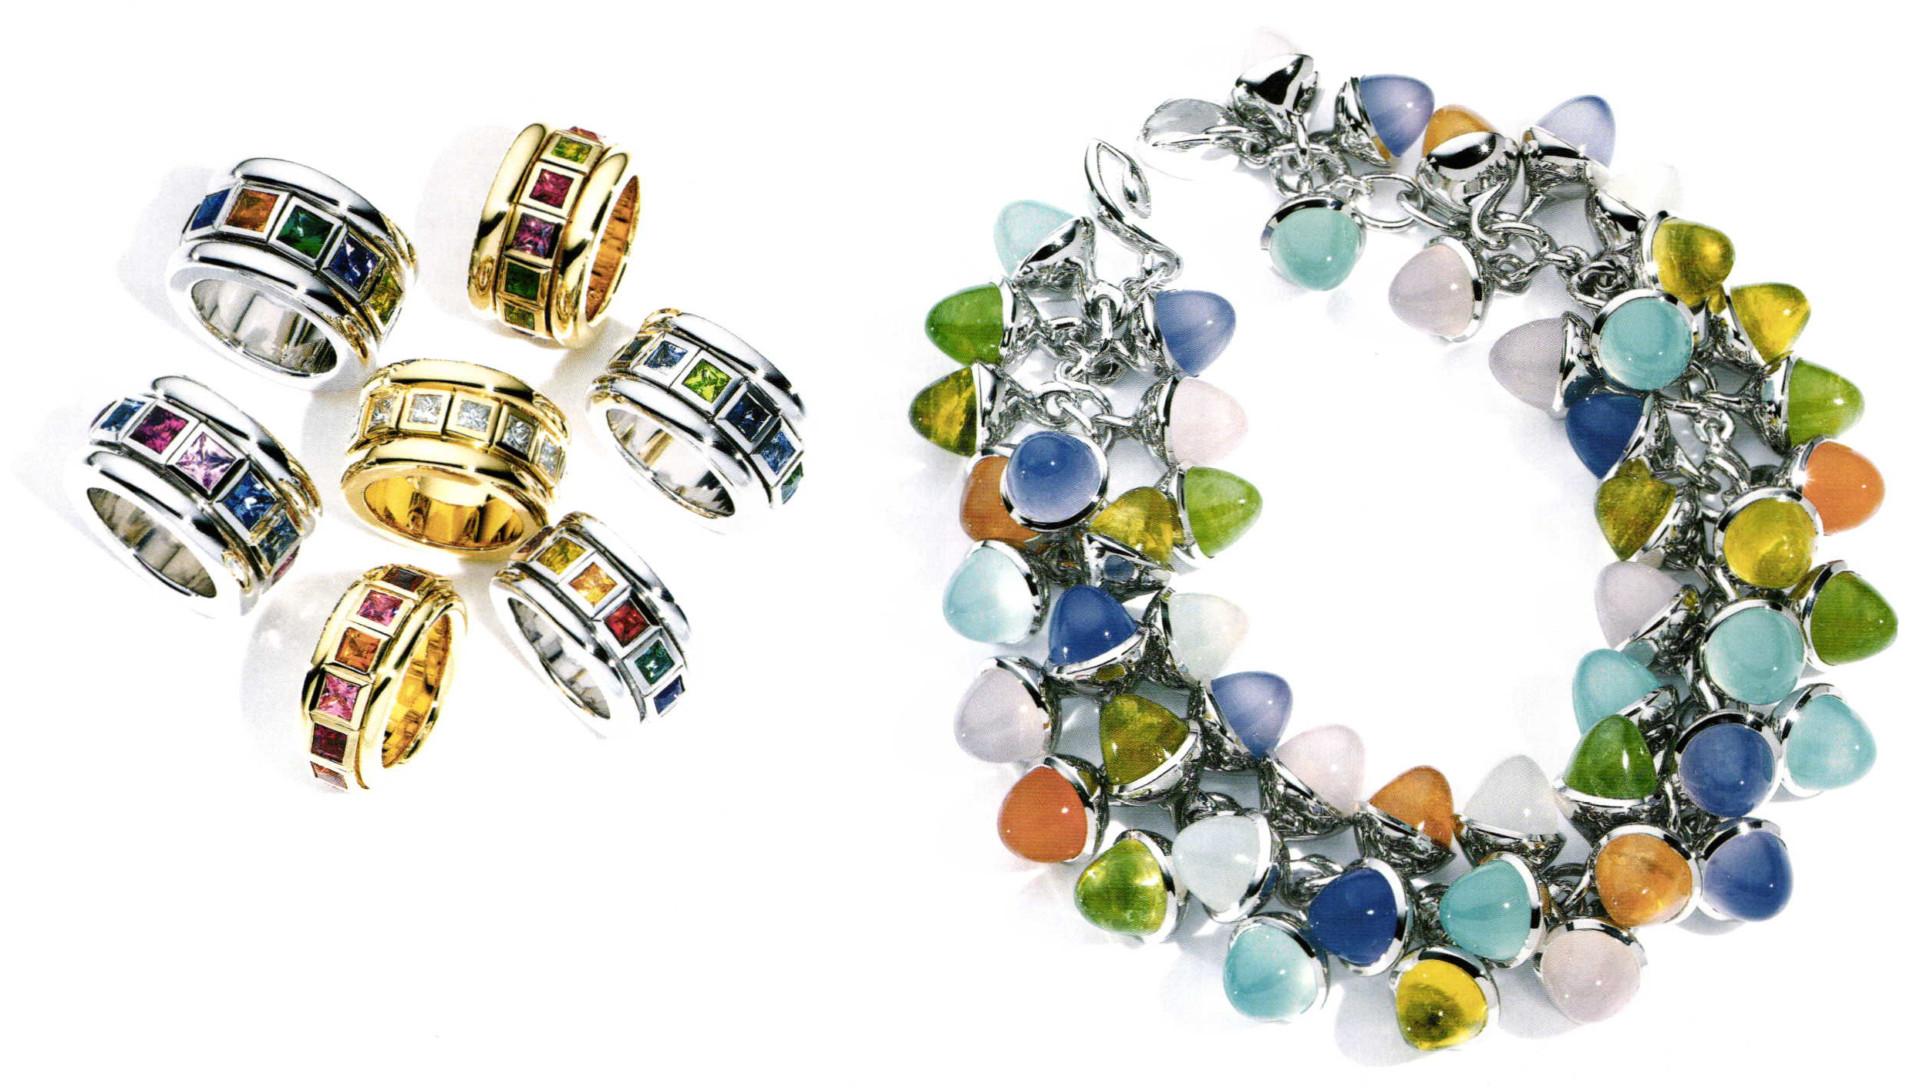 World largest jewelry exchange new york style guru for Jewelry exchange in hackensack new jersey